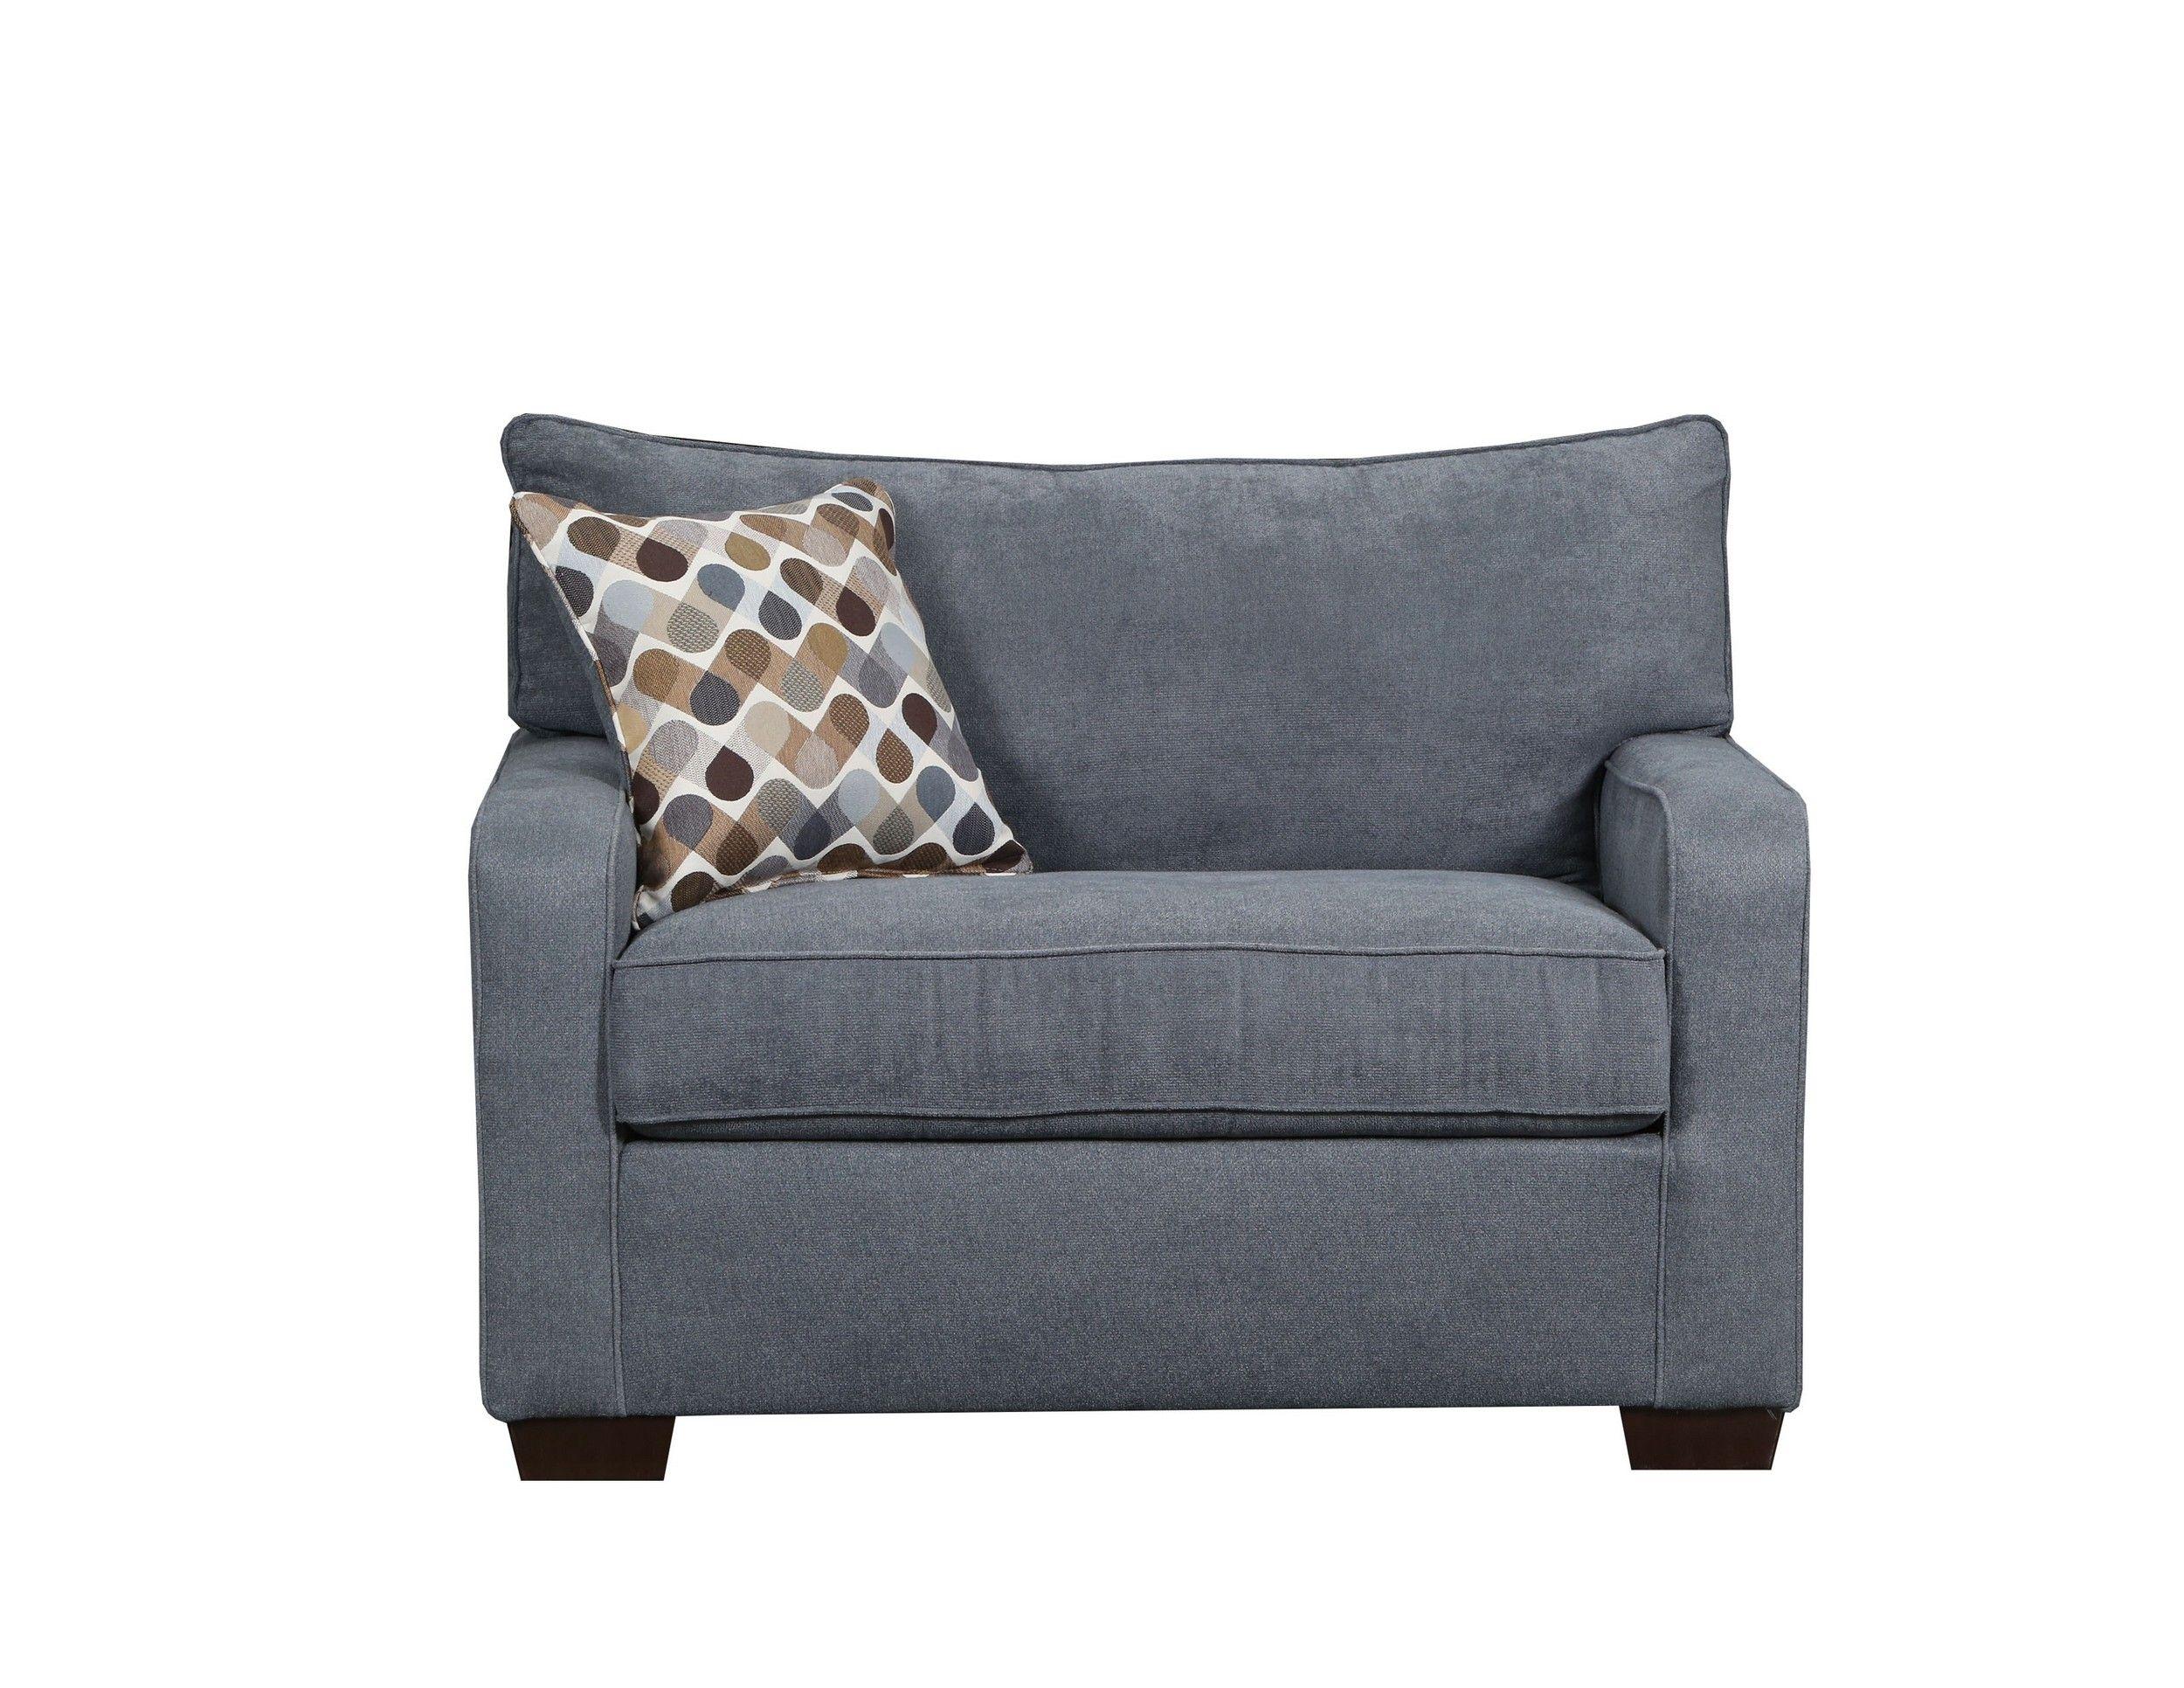 - Lowest Price On Simmons Upholstery Mia Denim Mini Sleeper Chair